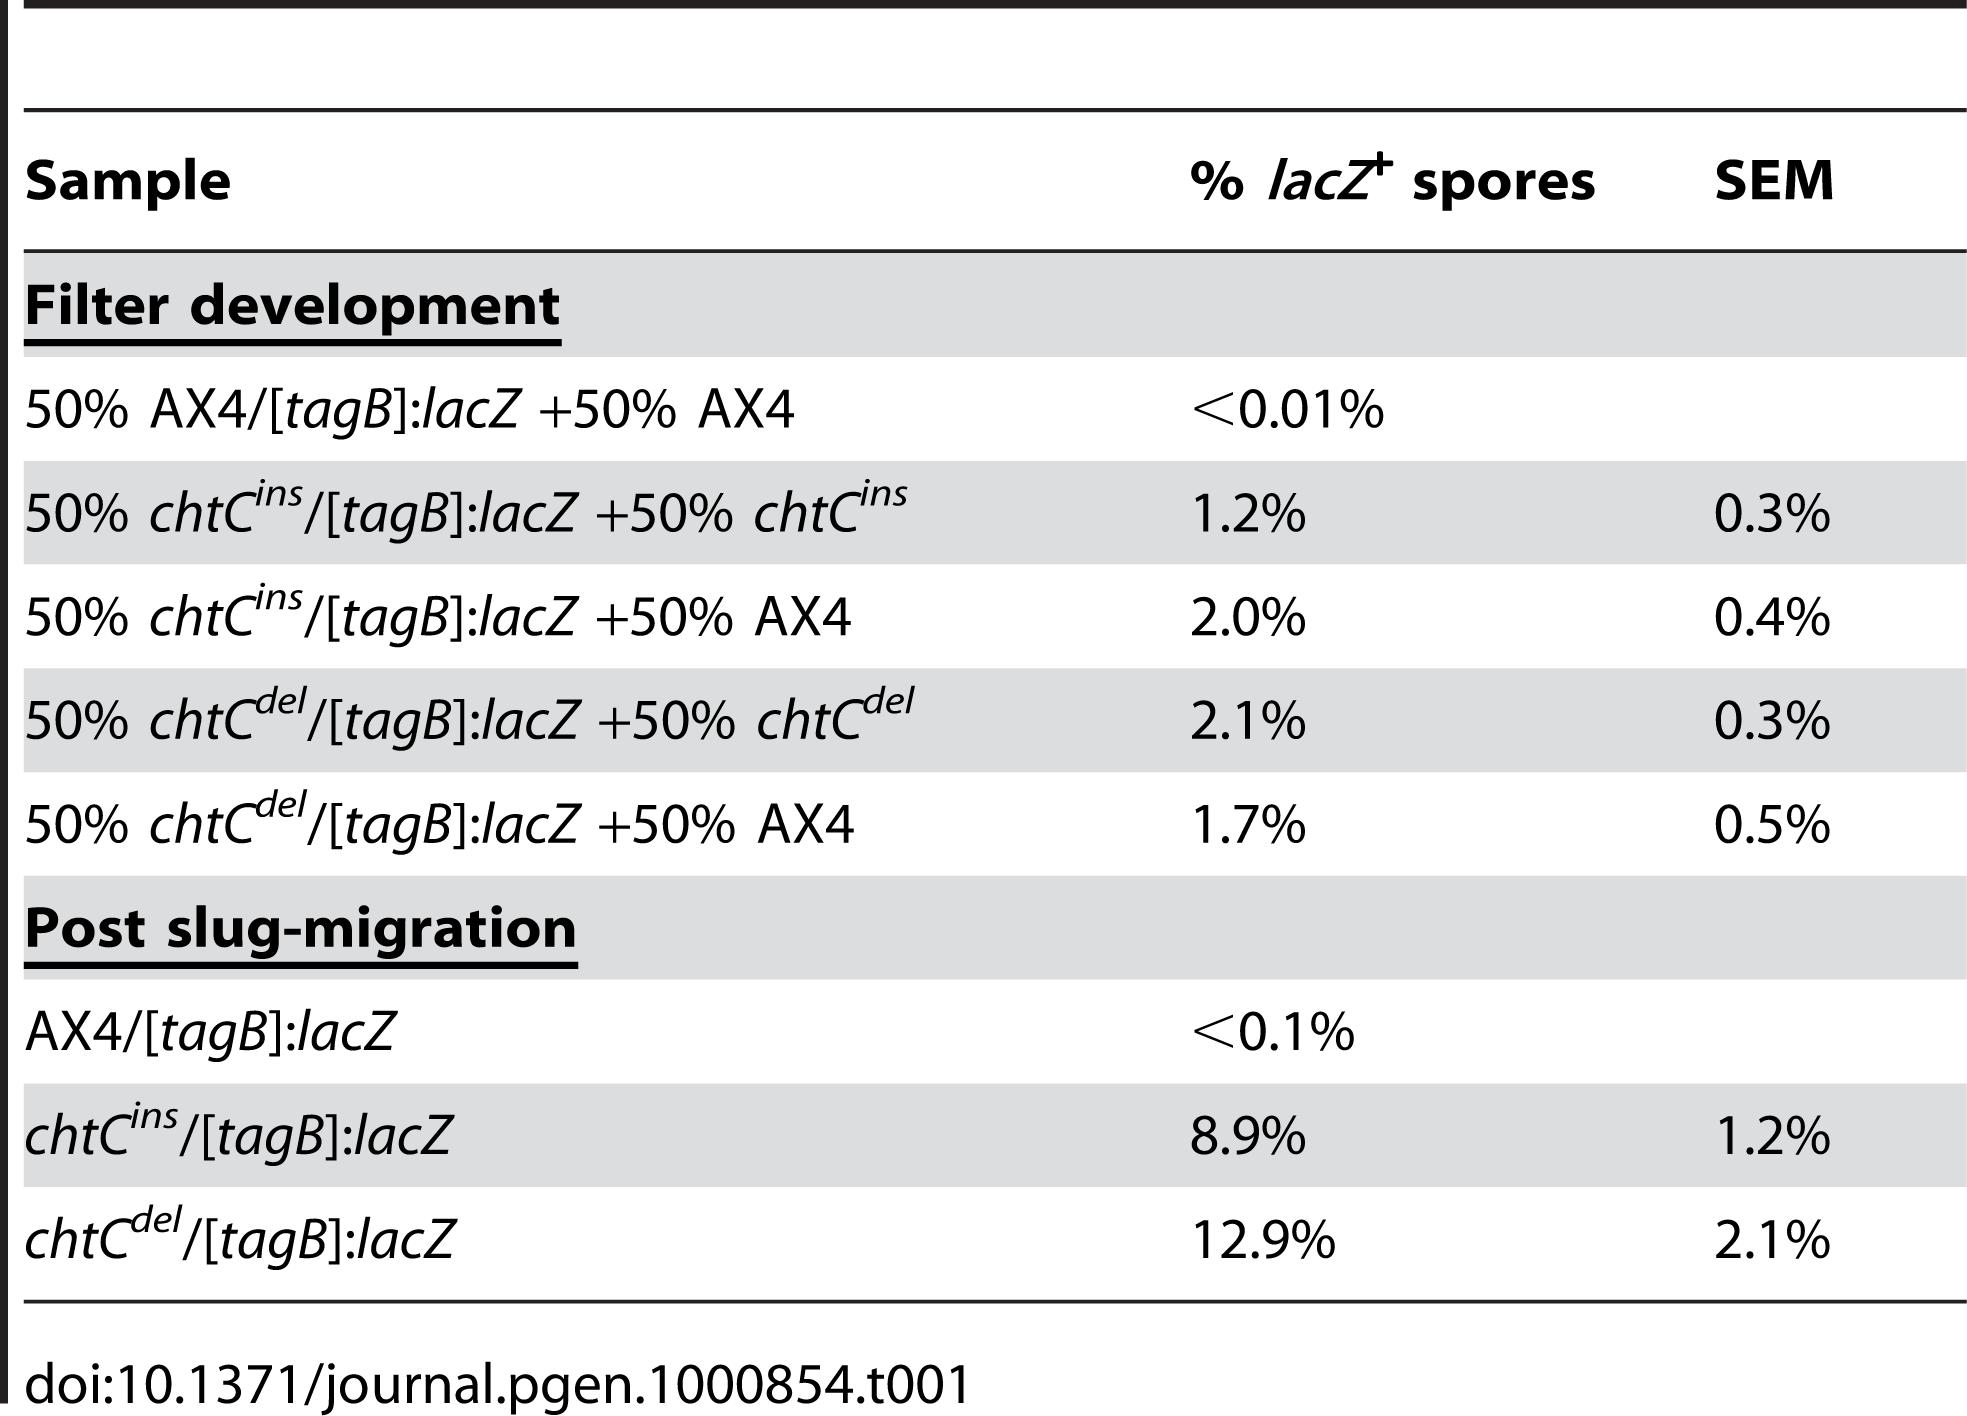 <i>chtC</i> spores have a prestalk history.